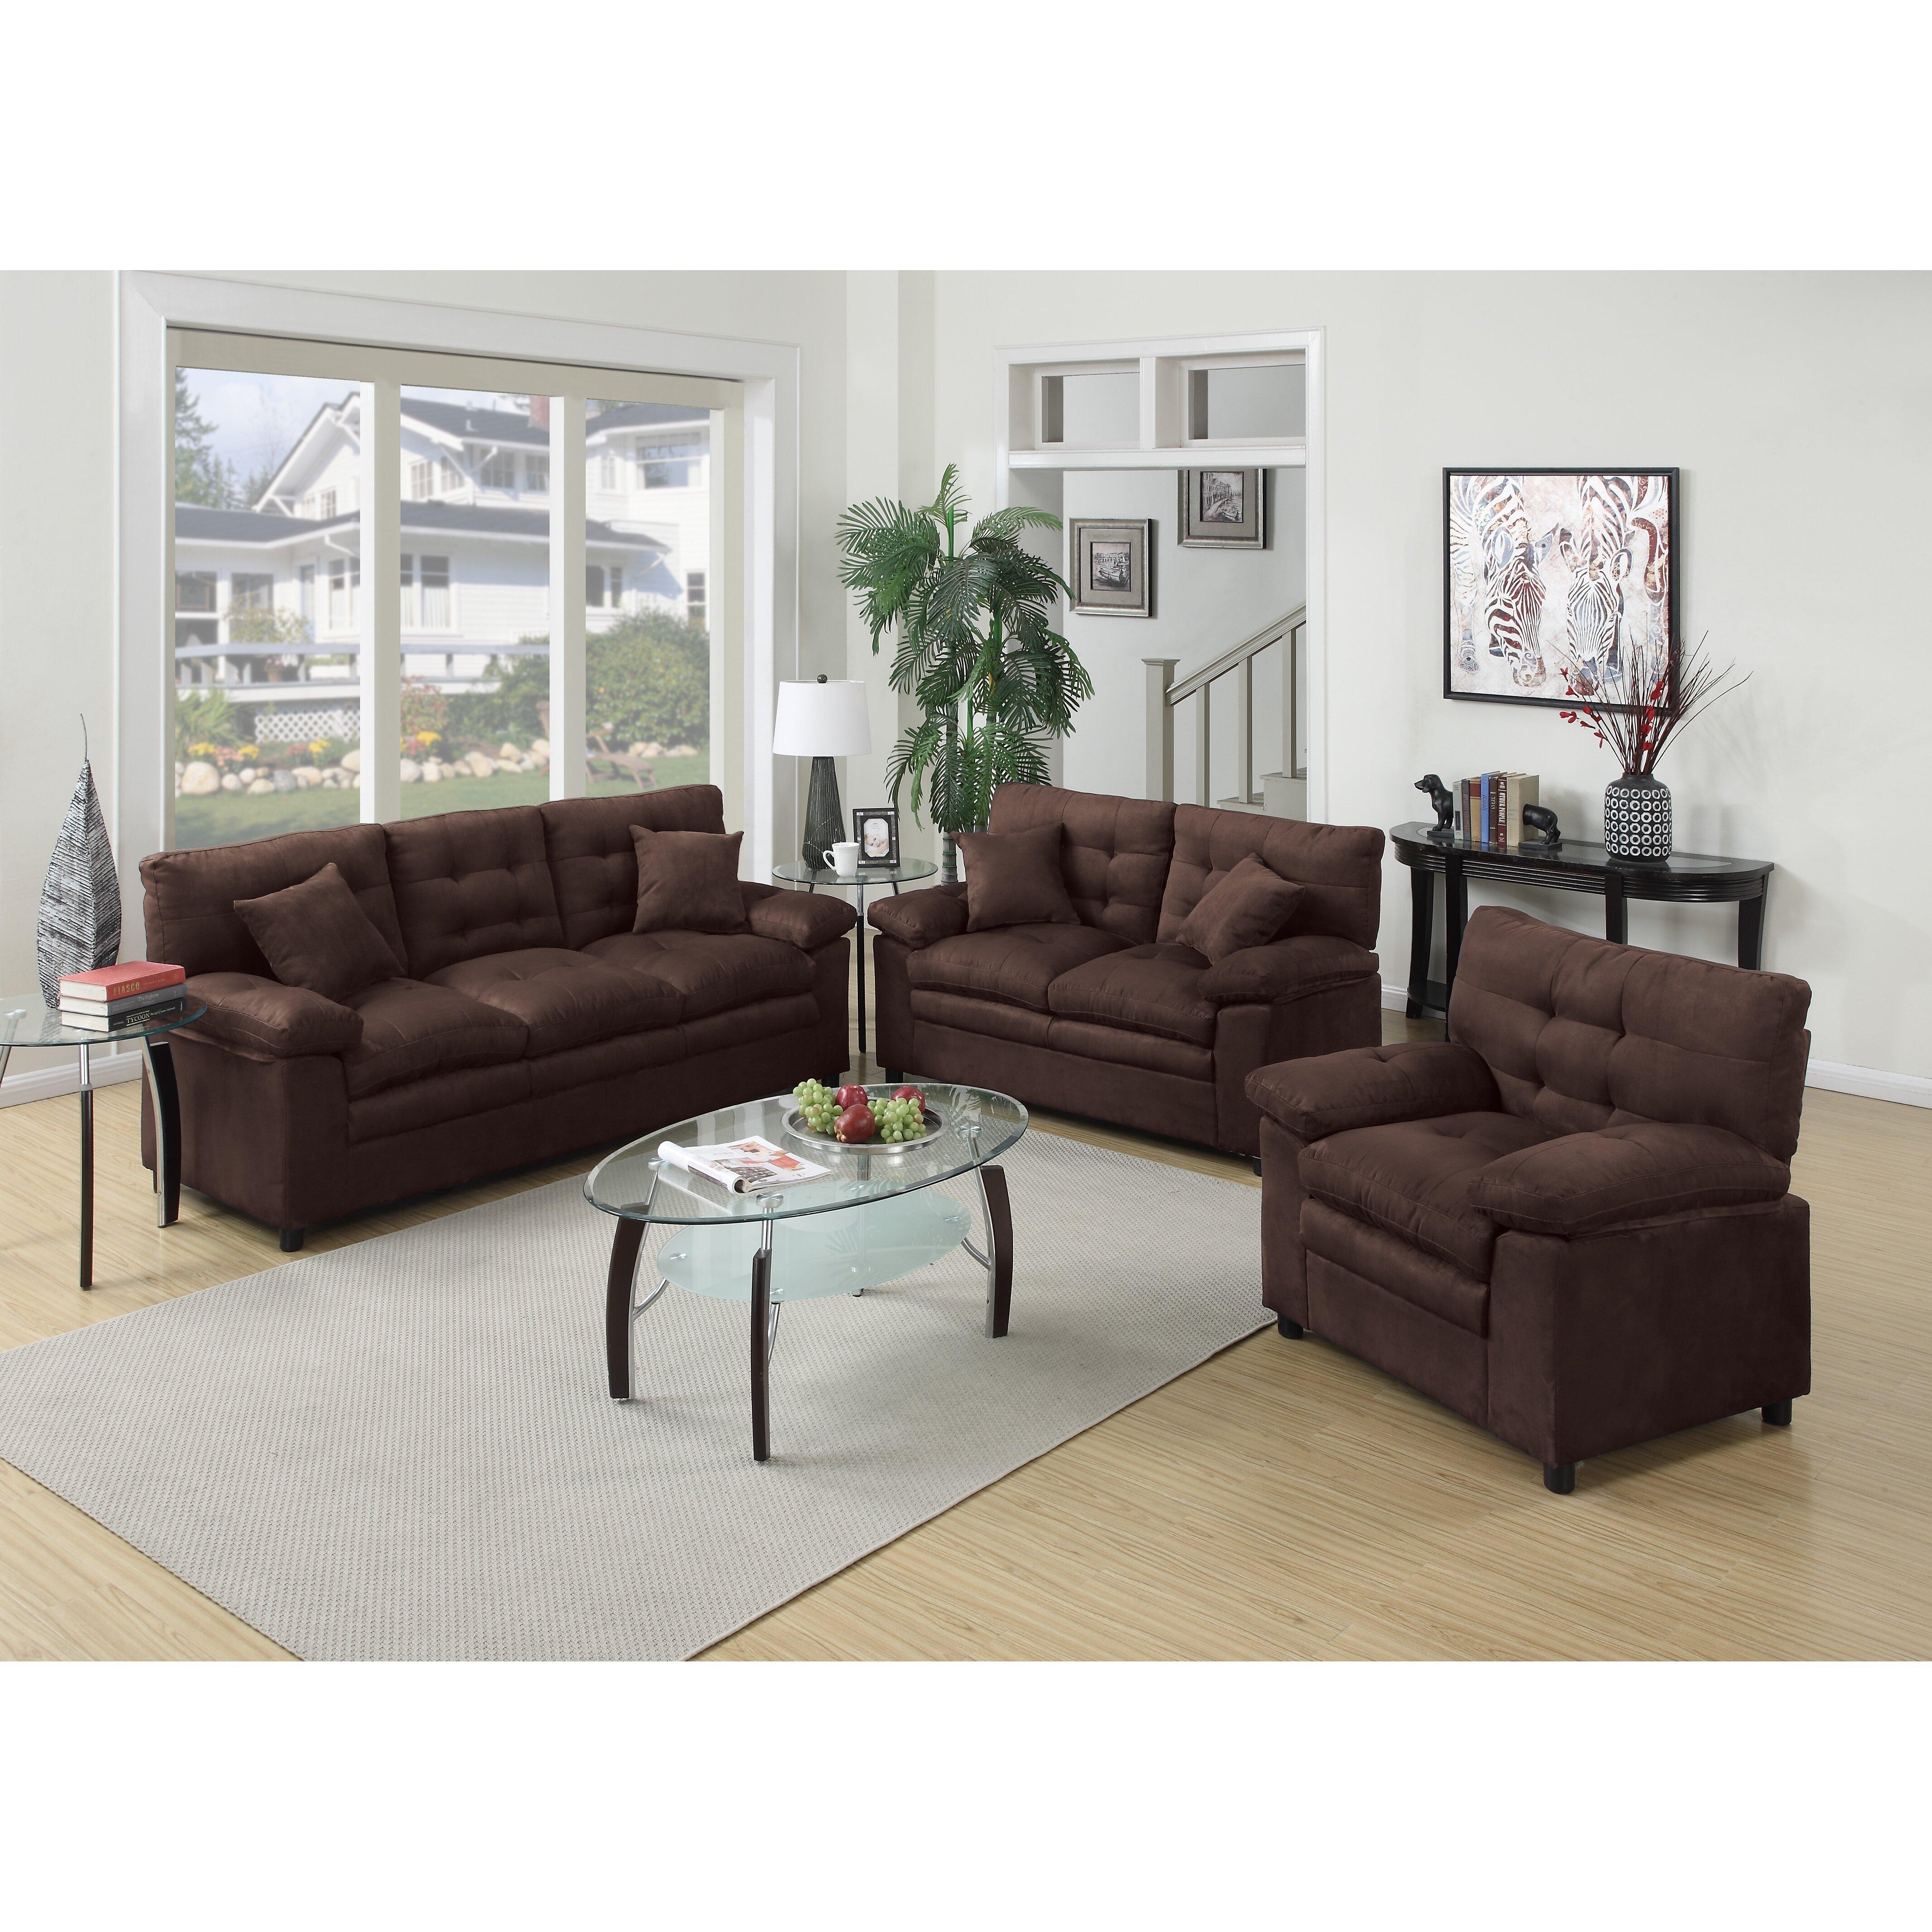 a j homes studio halifax 3 piece living room set reviews wayfair. Black Bedroom Furniture Sets. Home Design Ideas